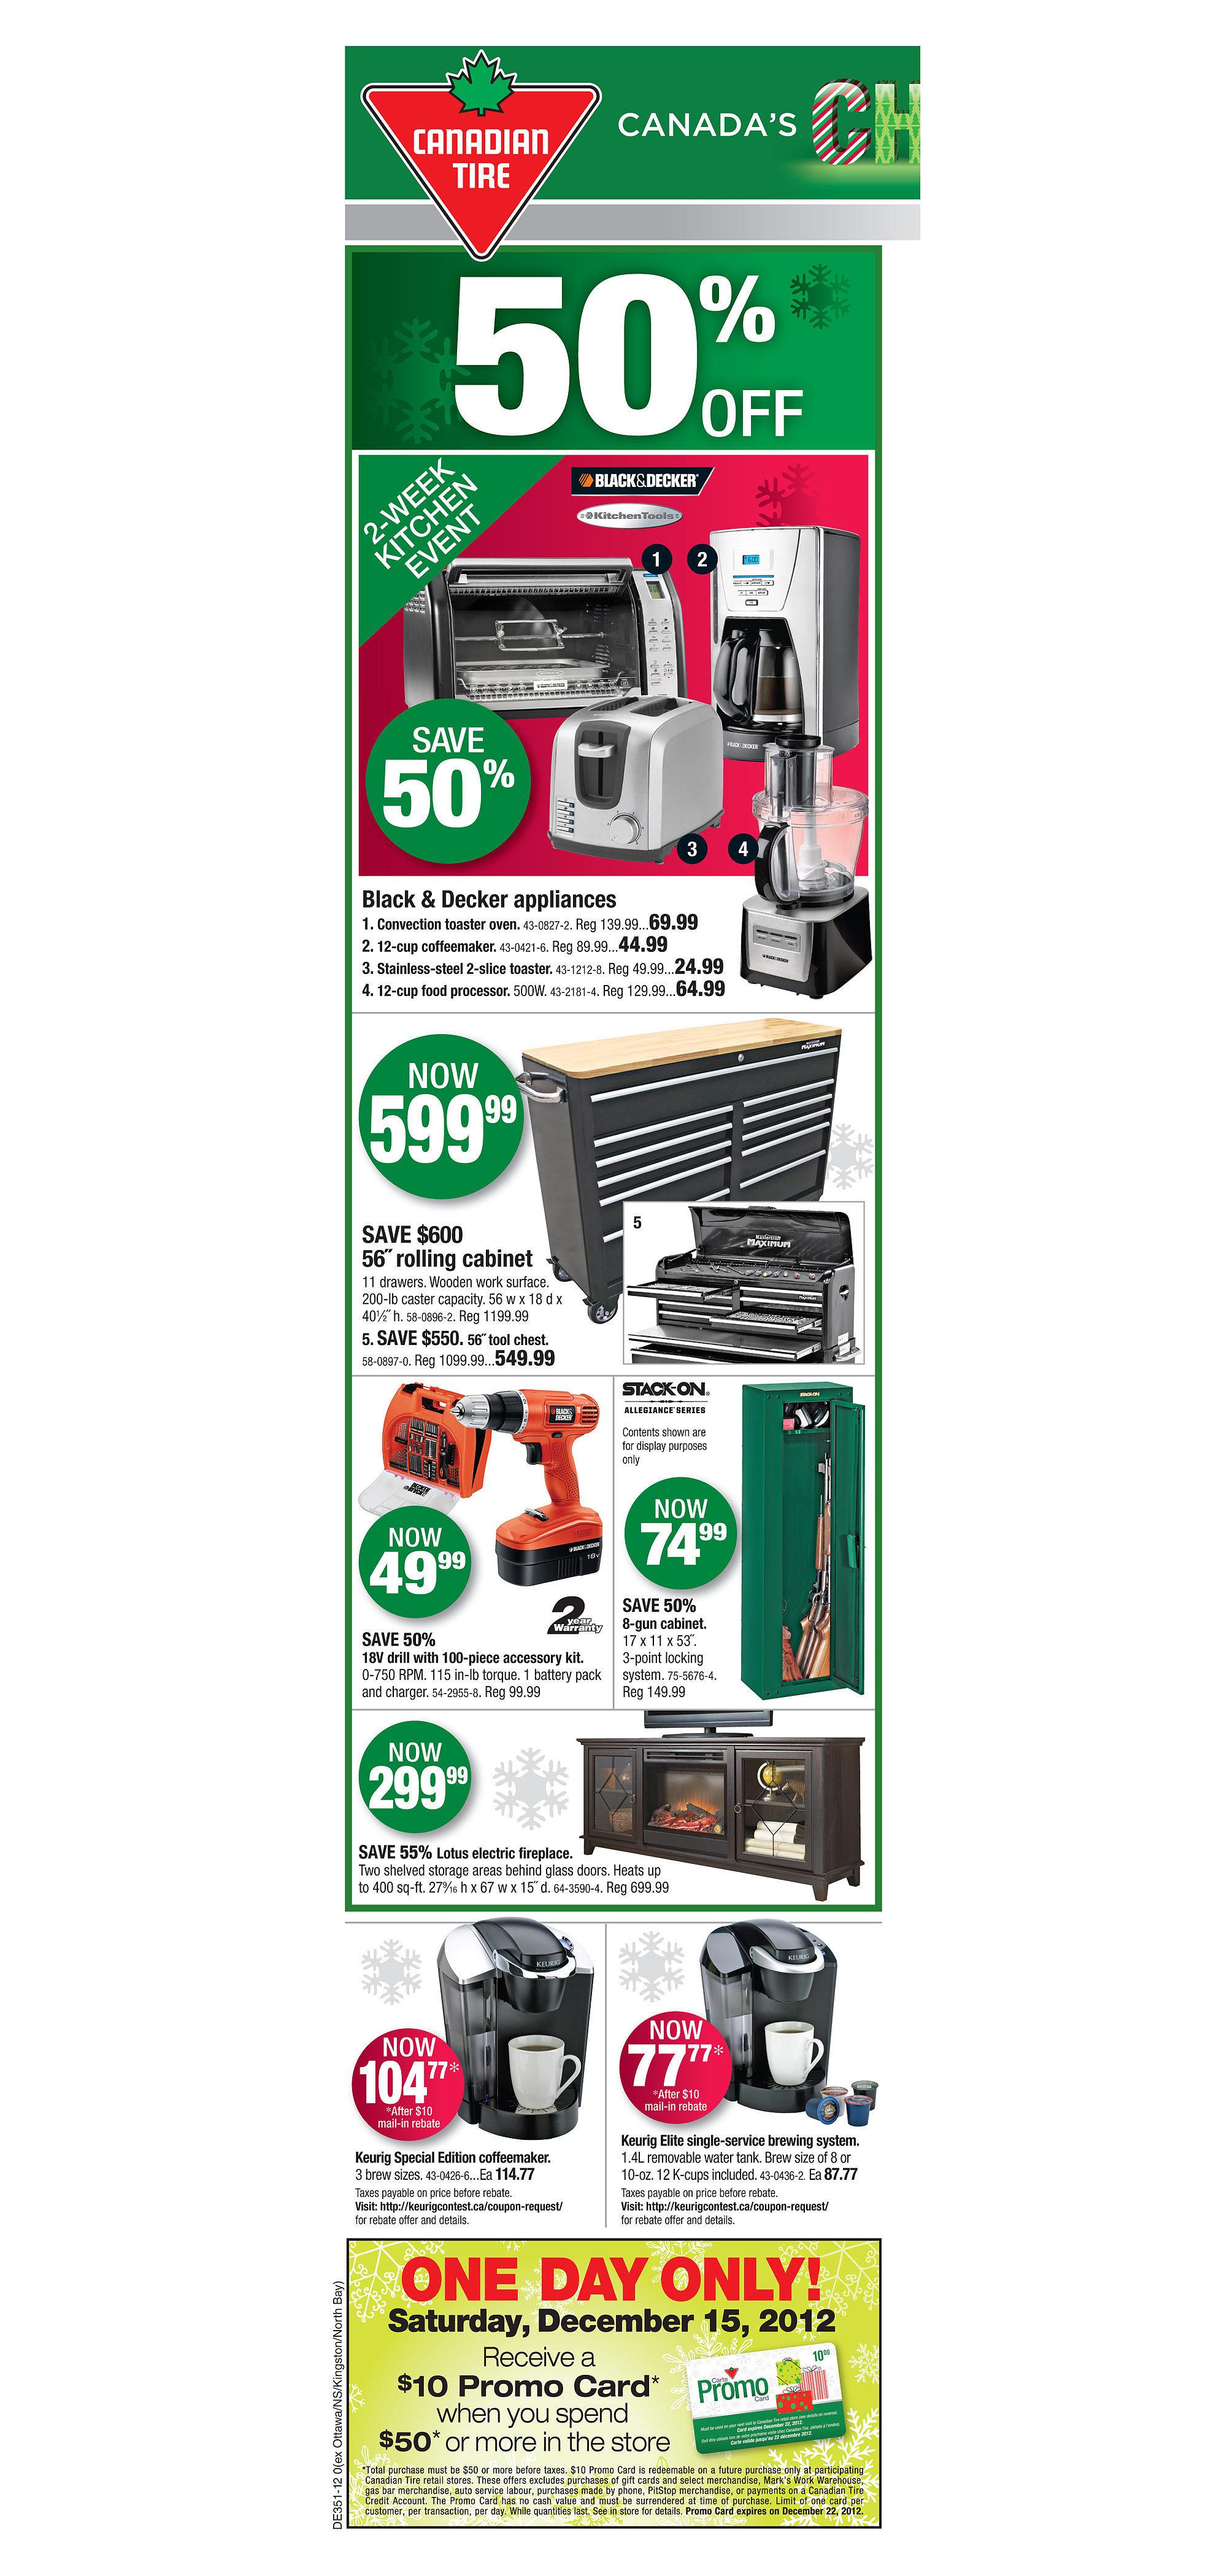 Canadian Tire Weekly Flyer Weekly Flyer Dec 13 20